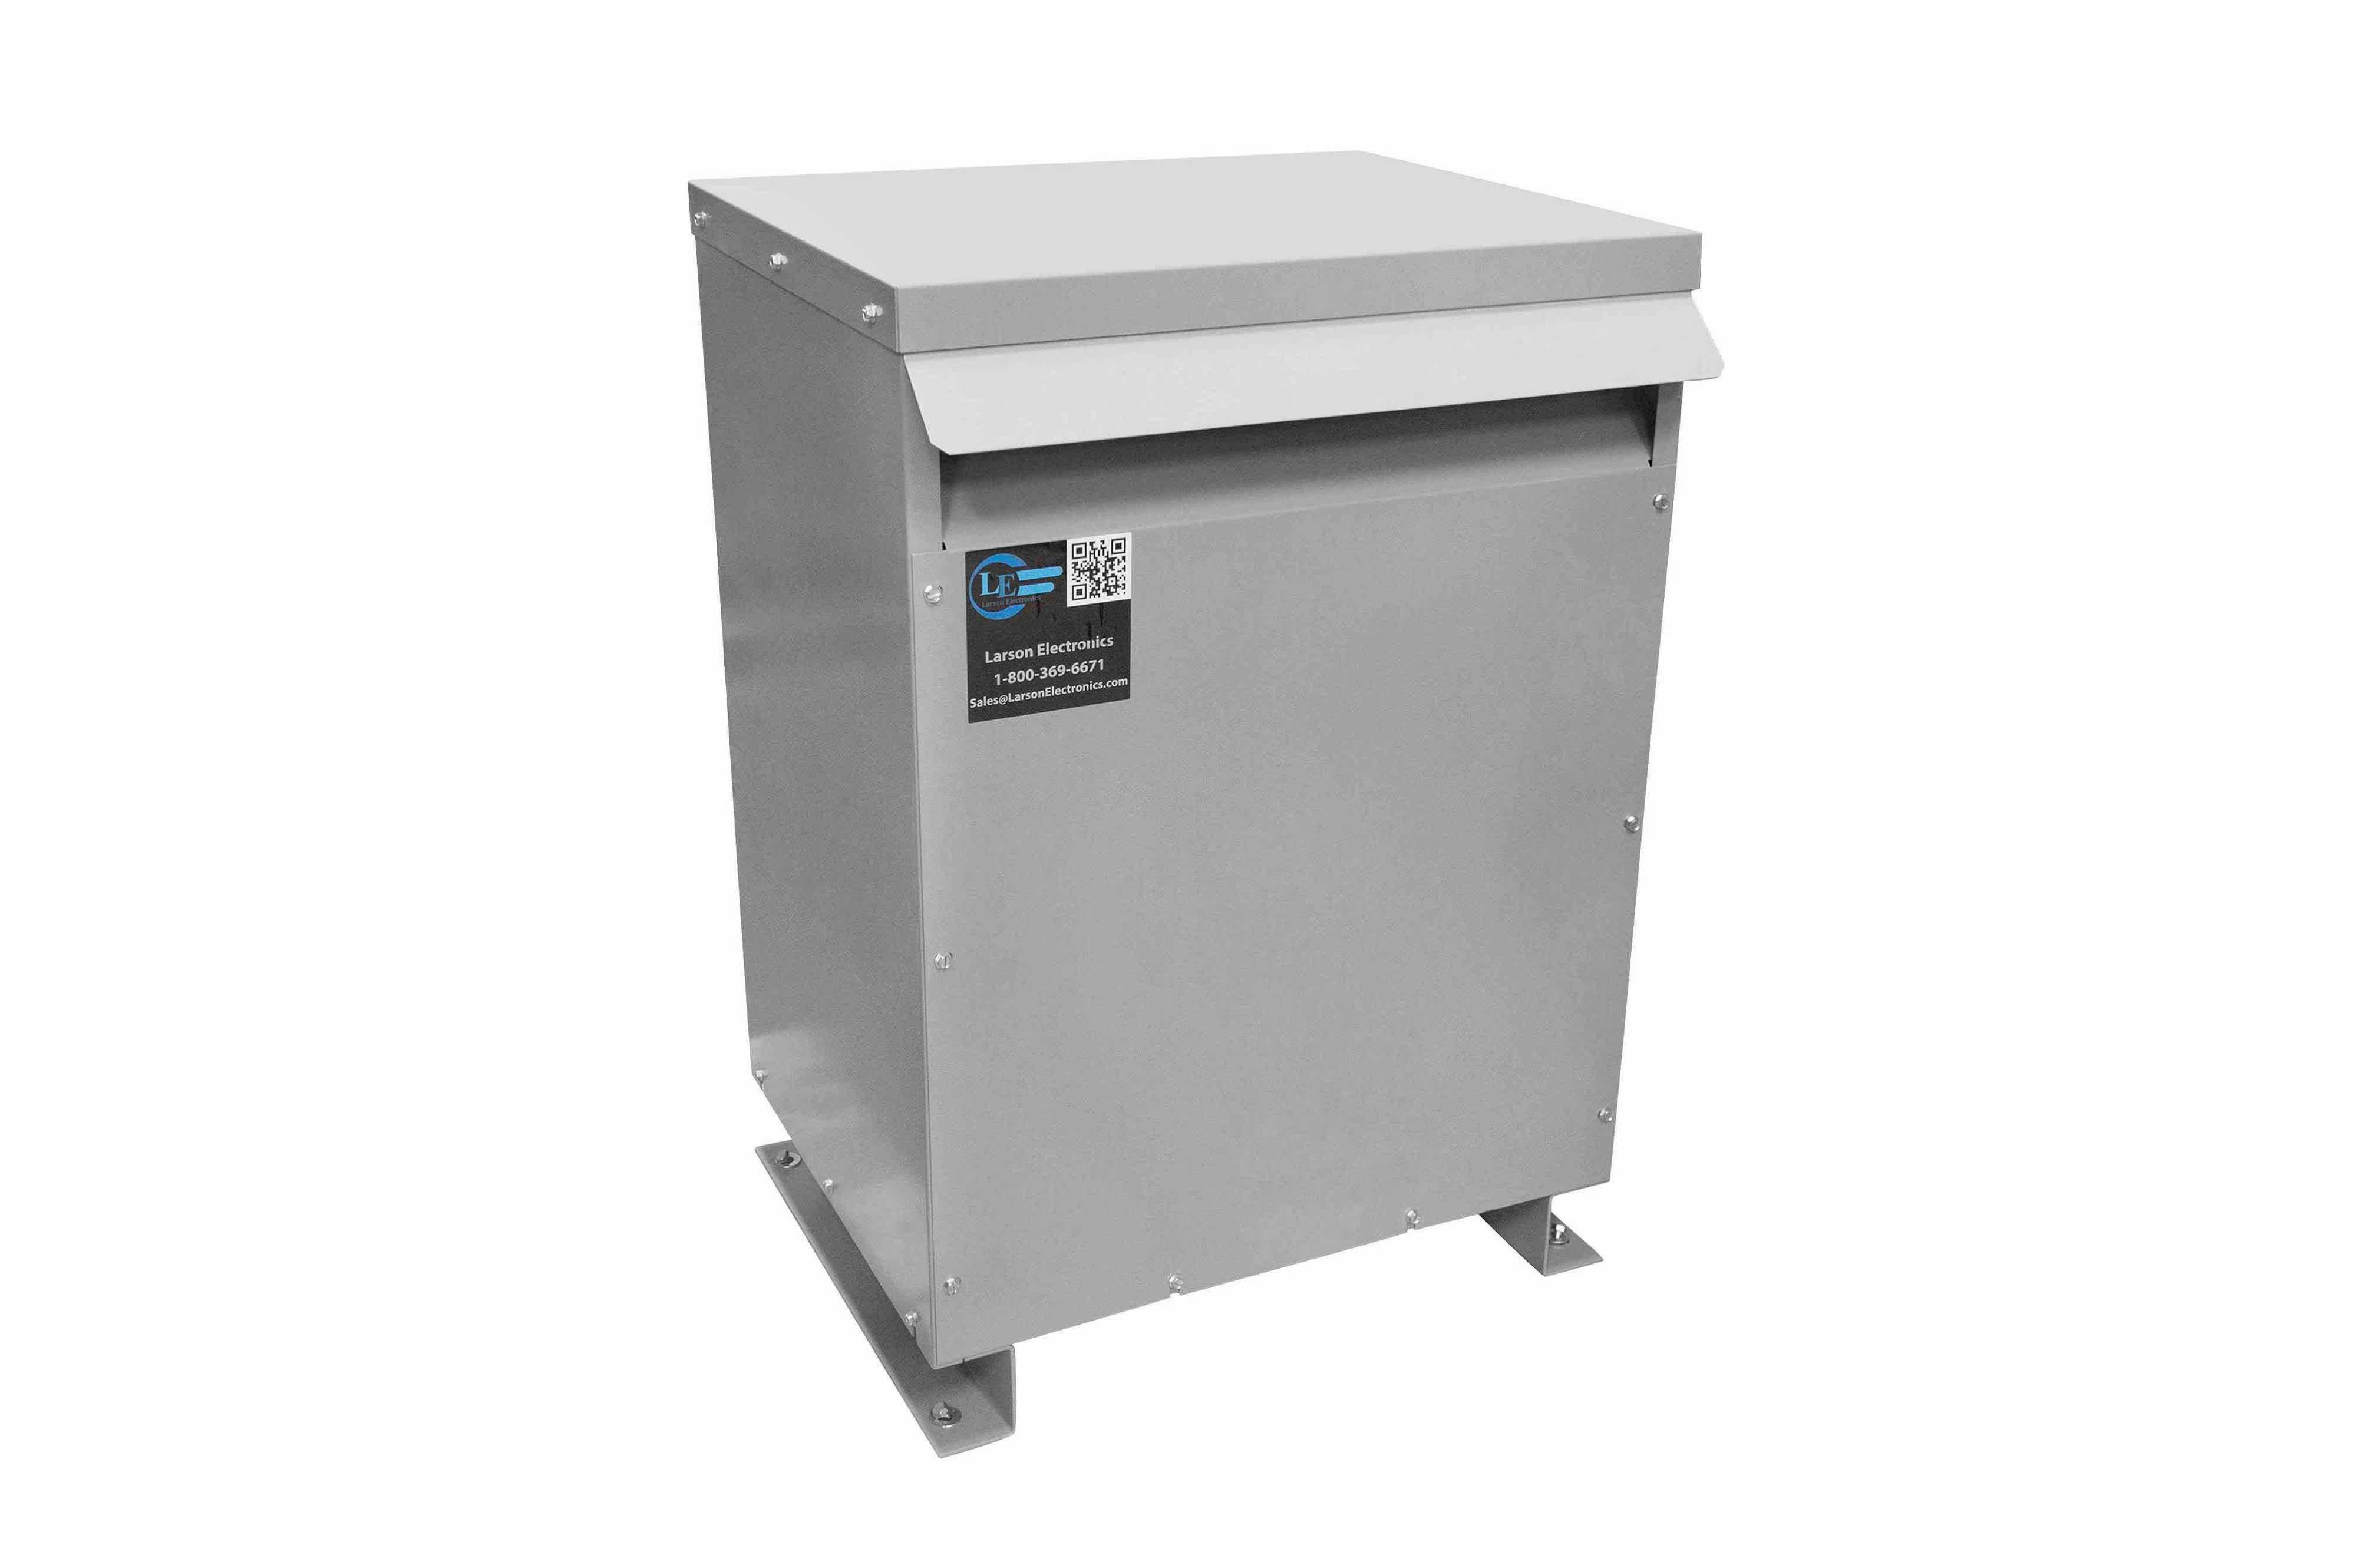 75 kVA 3PH Isolation Transformer, 415V Wye Primary, 240V/120 Delta Secondary, N3R, Ventilated, 60 Hz